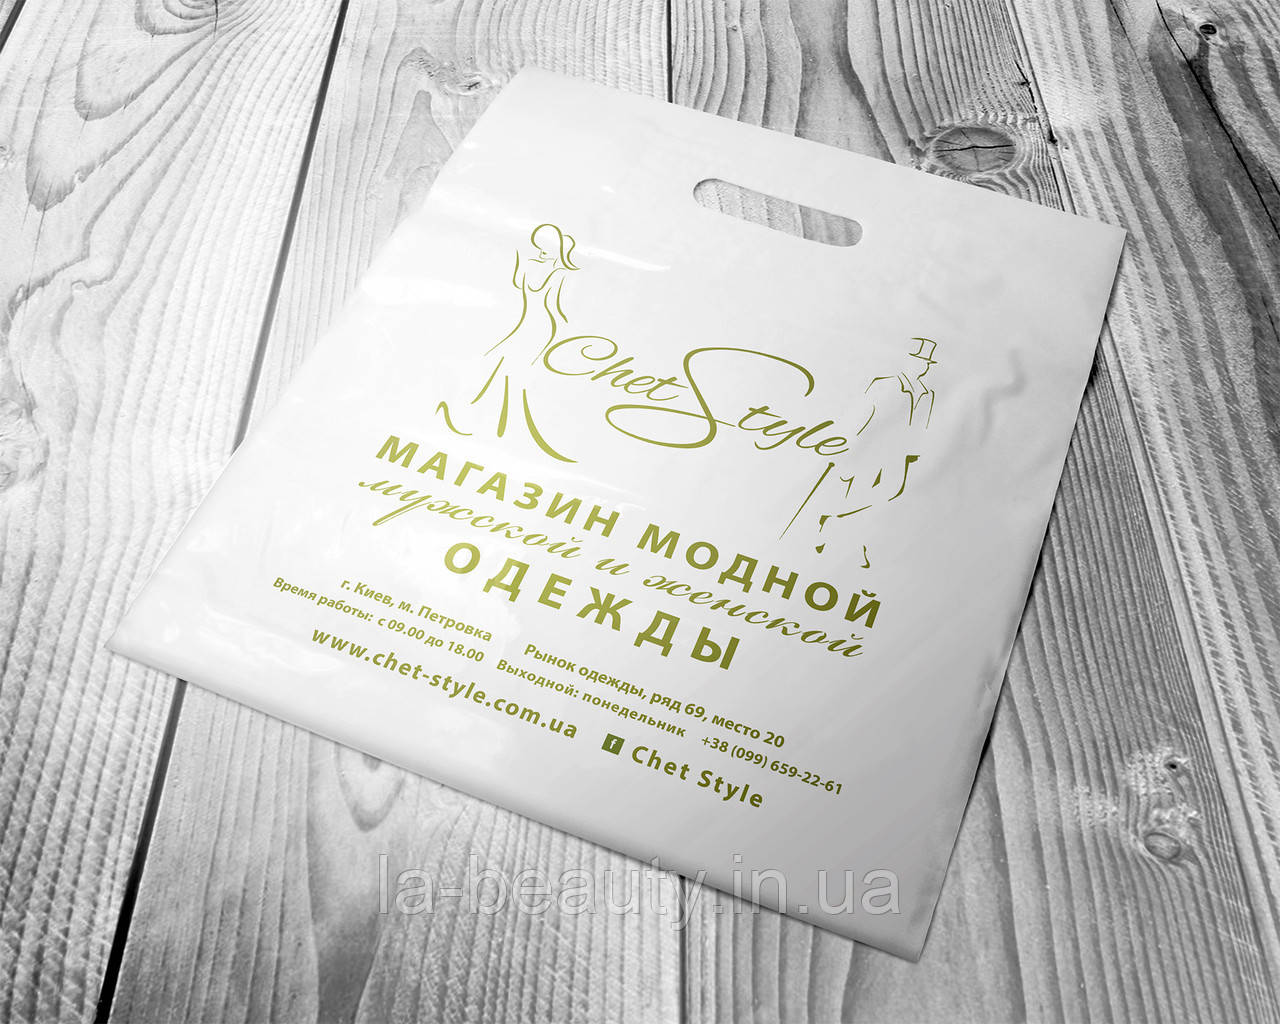 Дизайн и производство пакетов